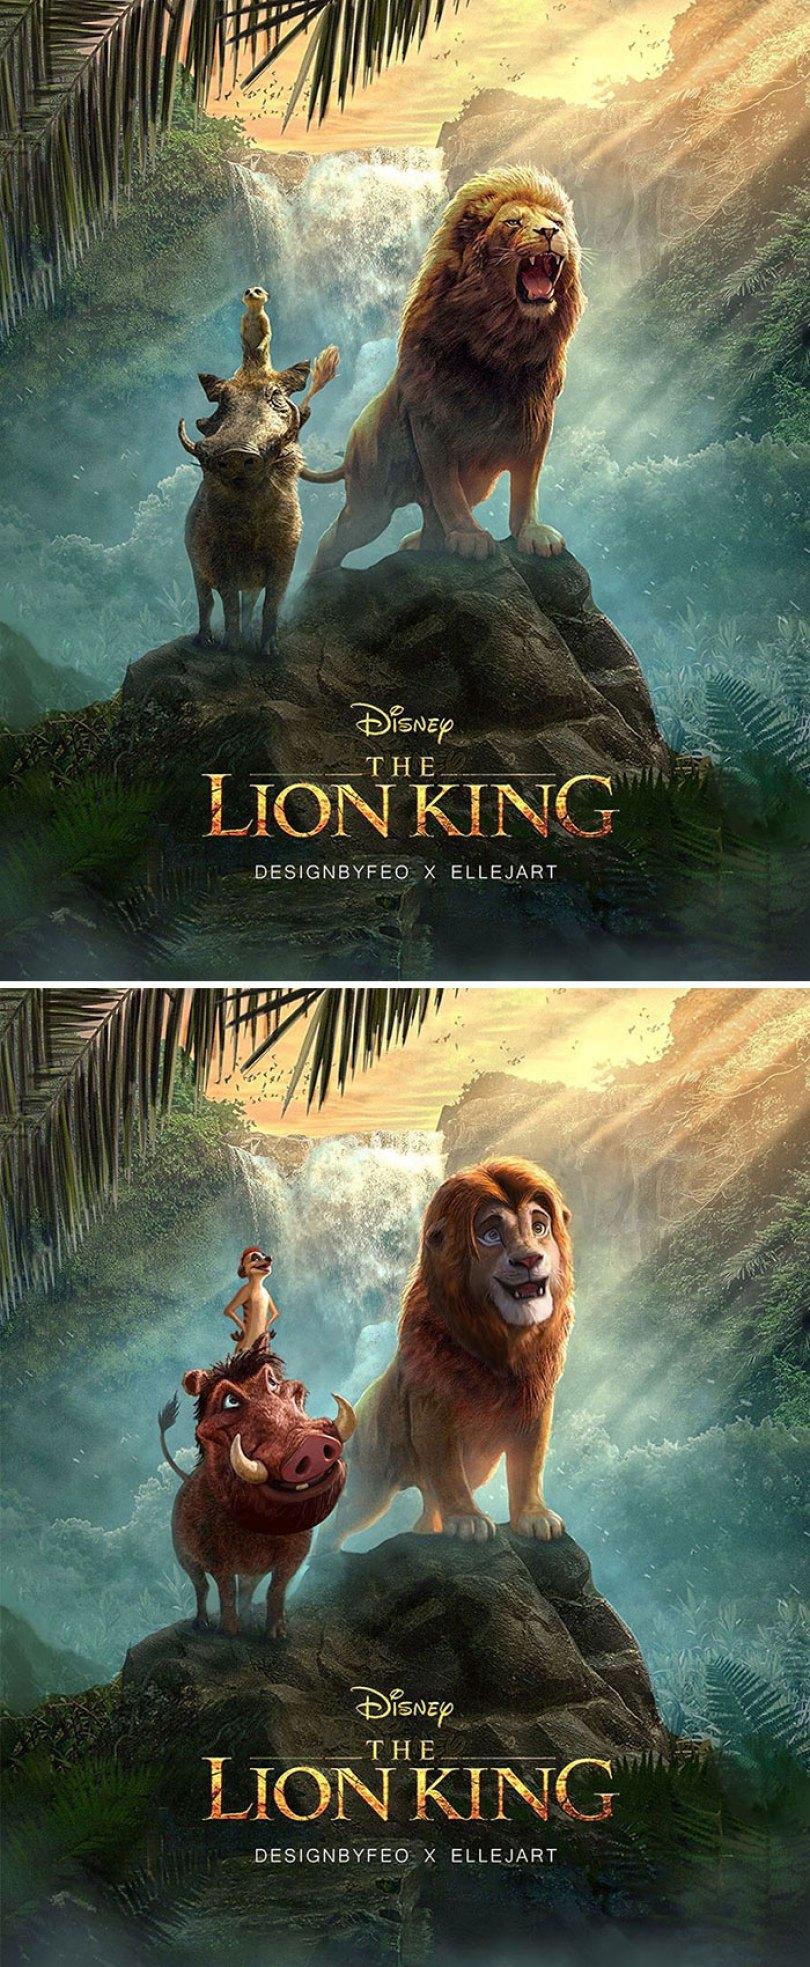 lion king live action fan remake nikolay mochkin 5d36c0935324f  700 - Olhar Alternativo ao Rei Leão live-action Remake 2019